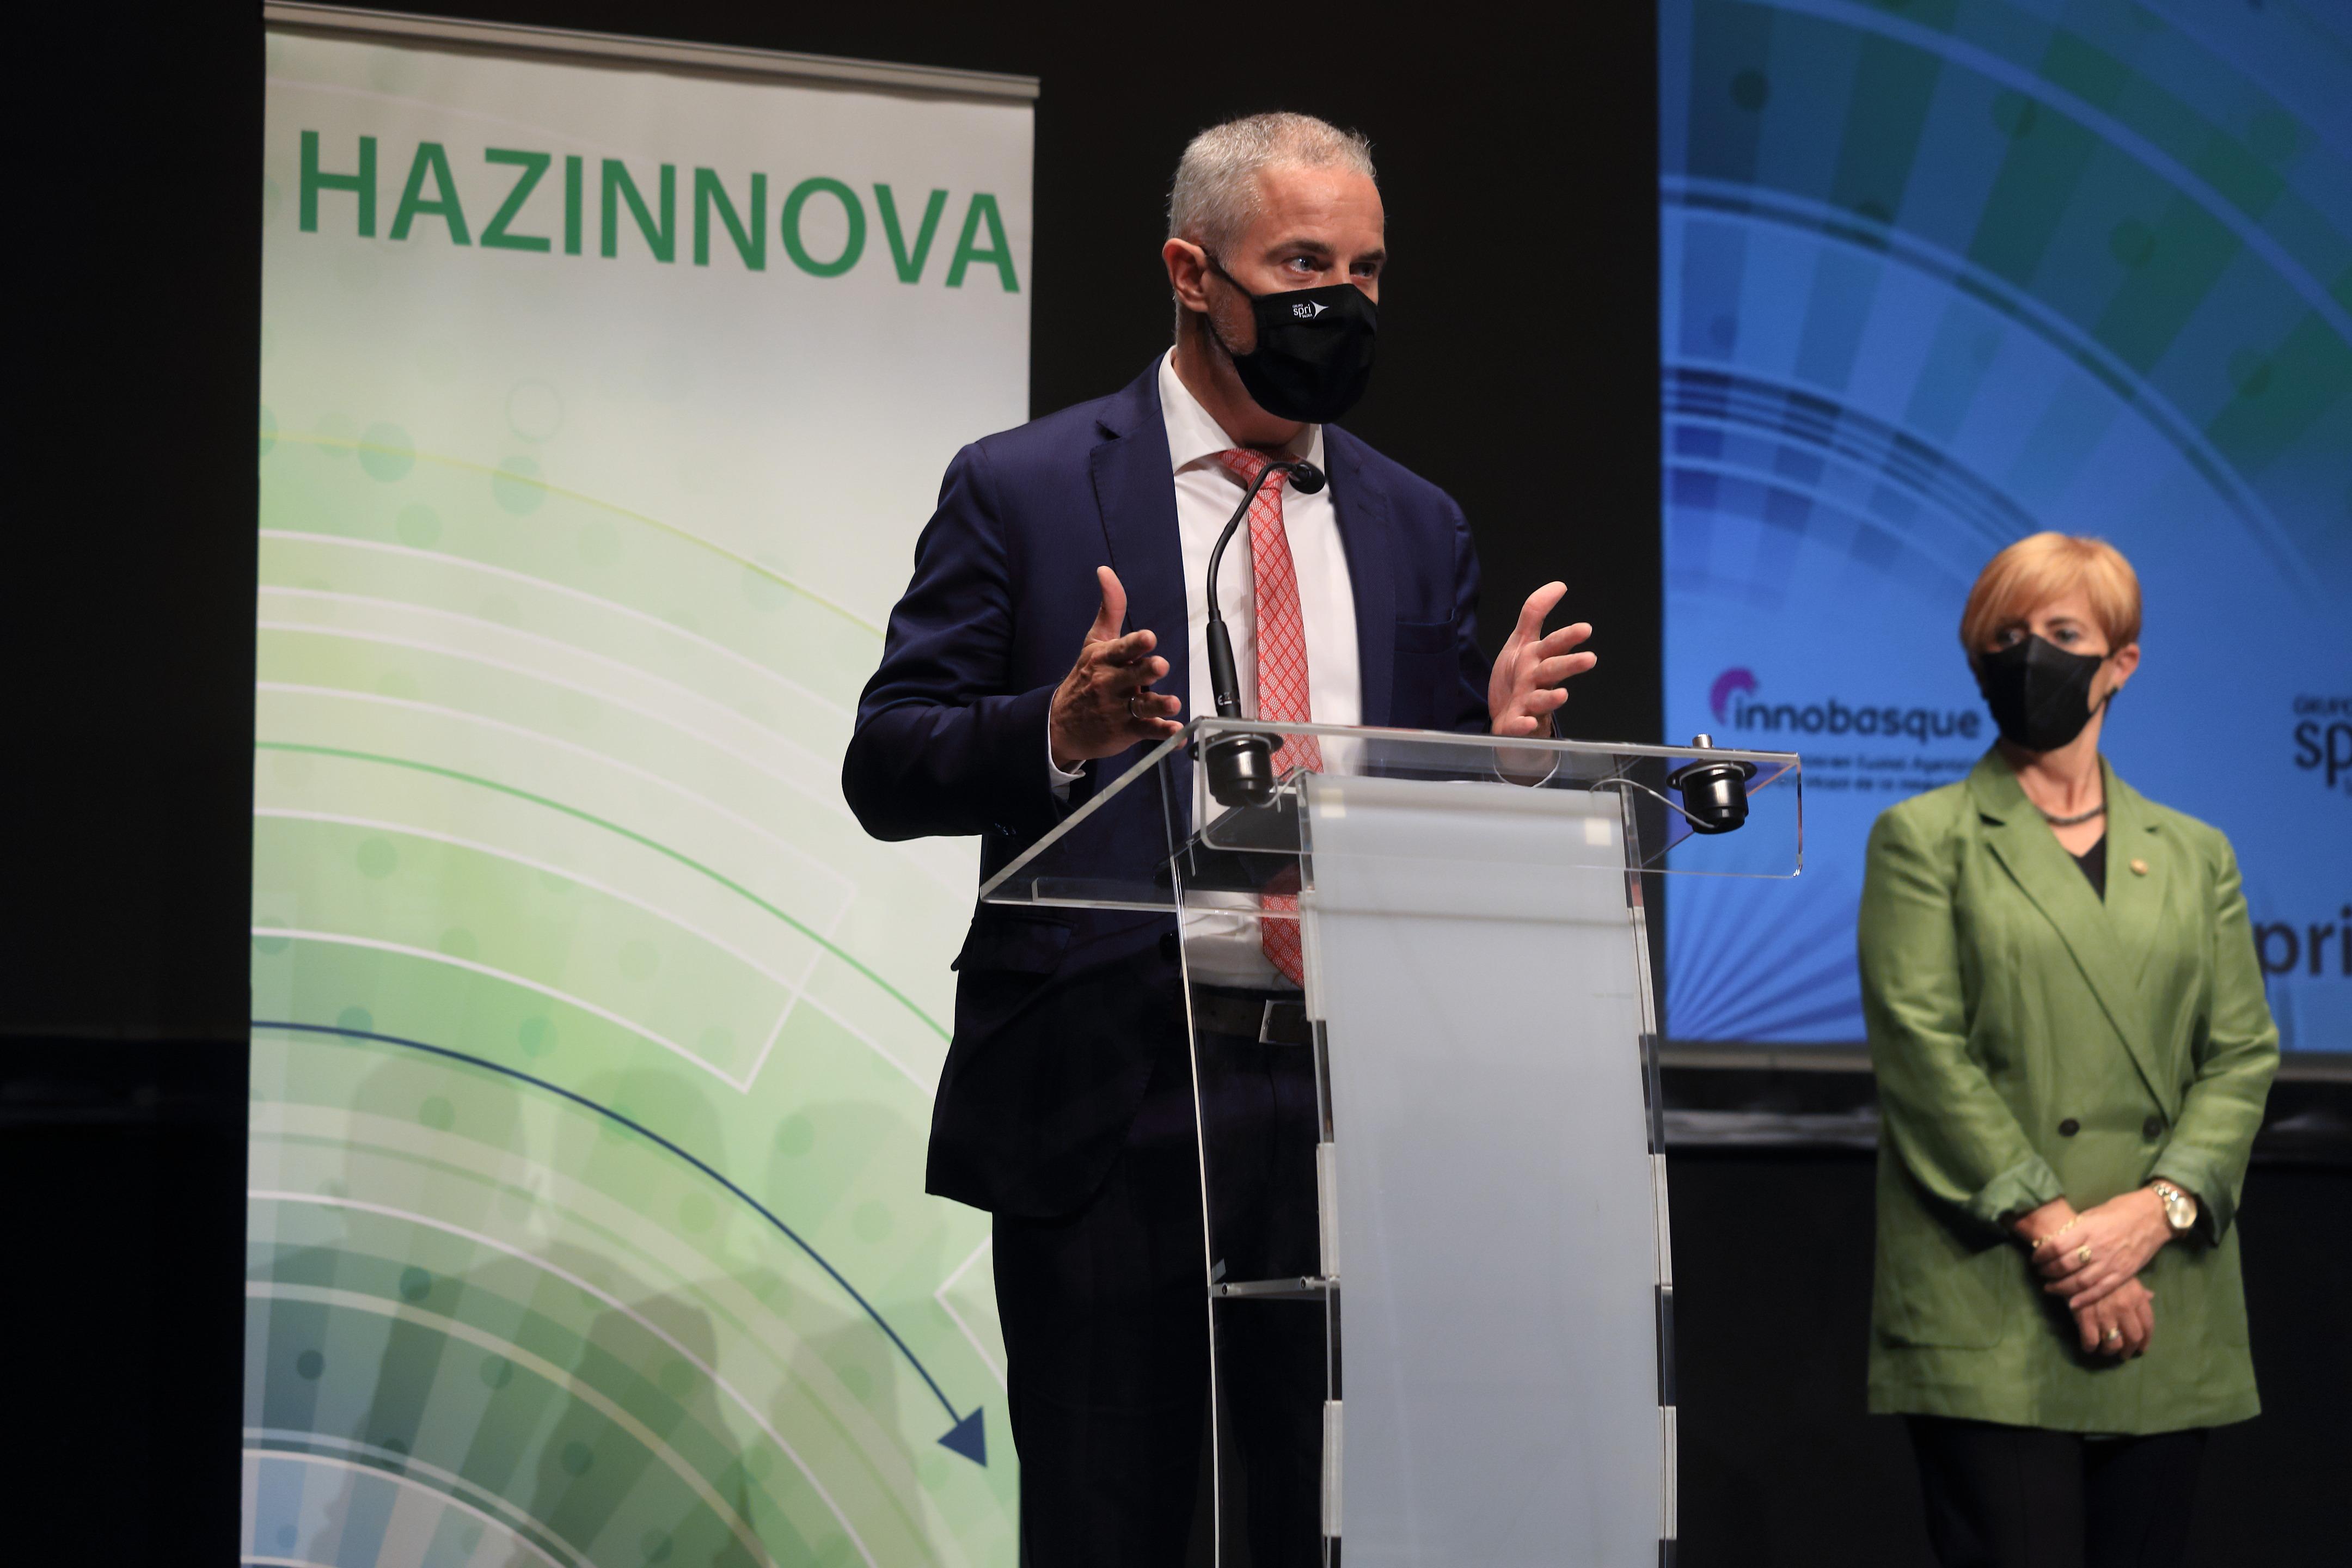 Hazinnova09.JPG